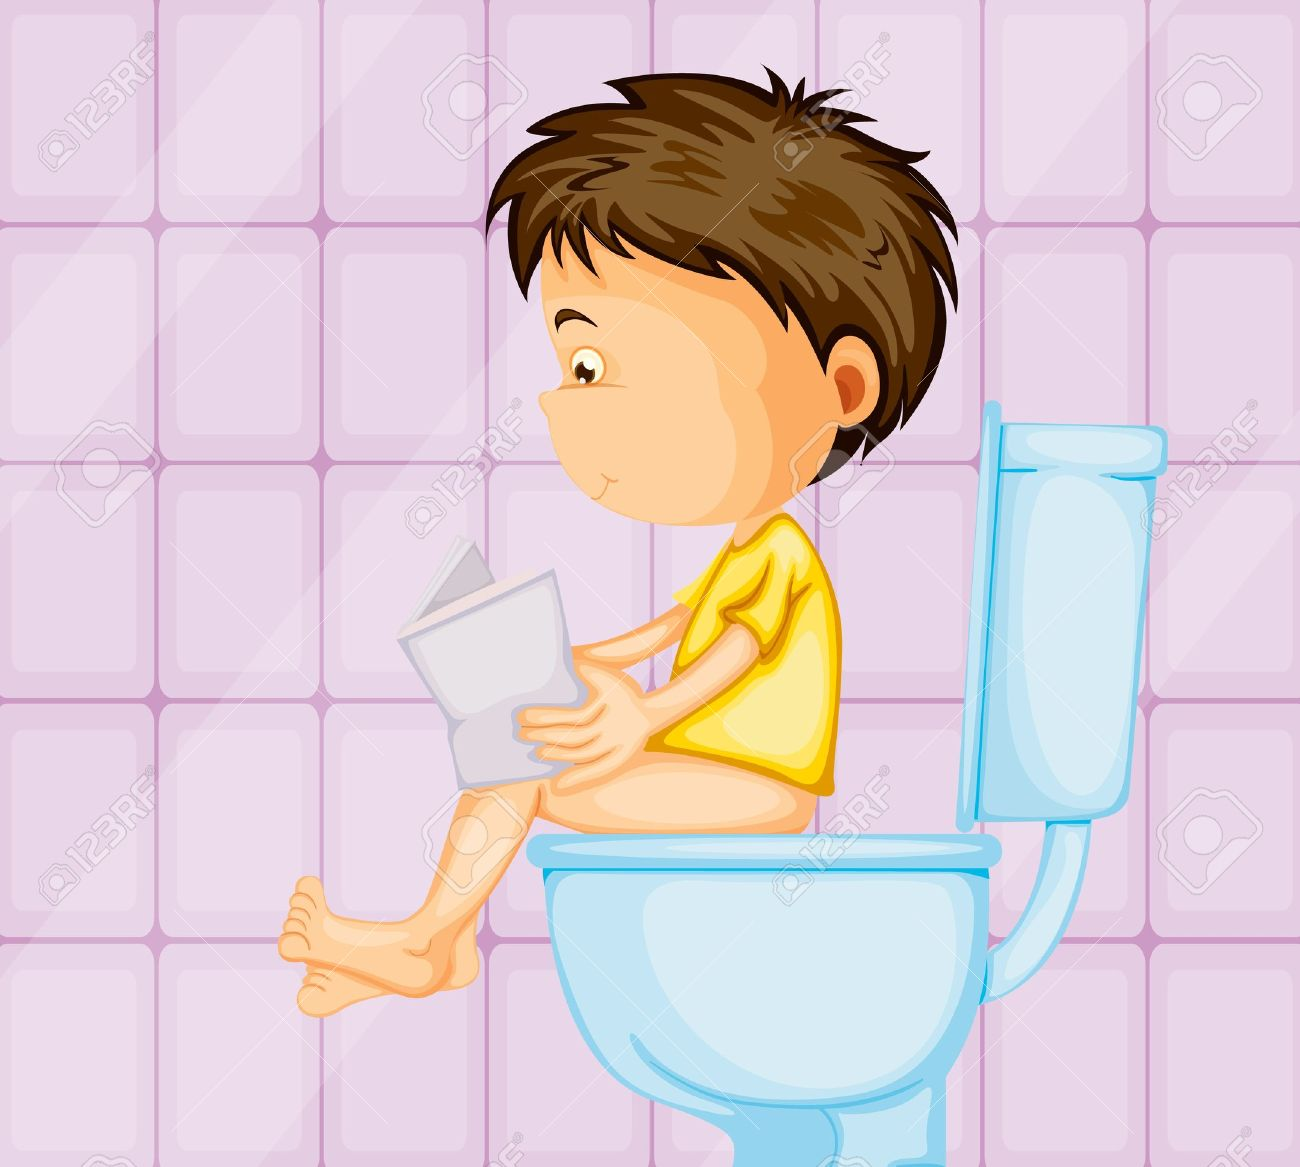 Kind auf toilette clipart.